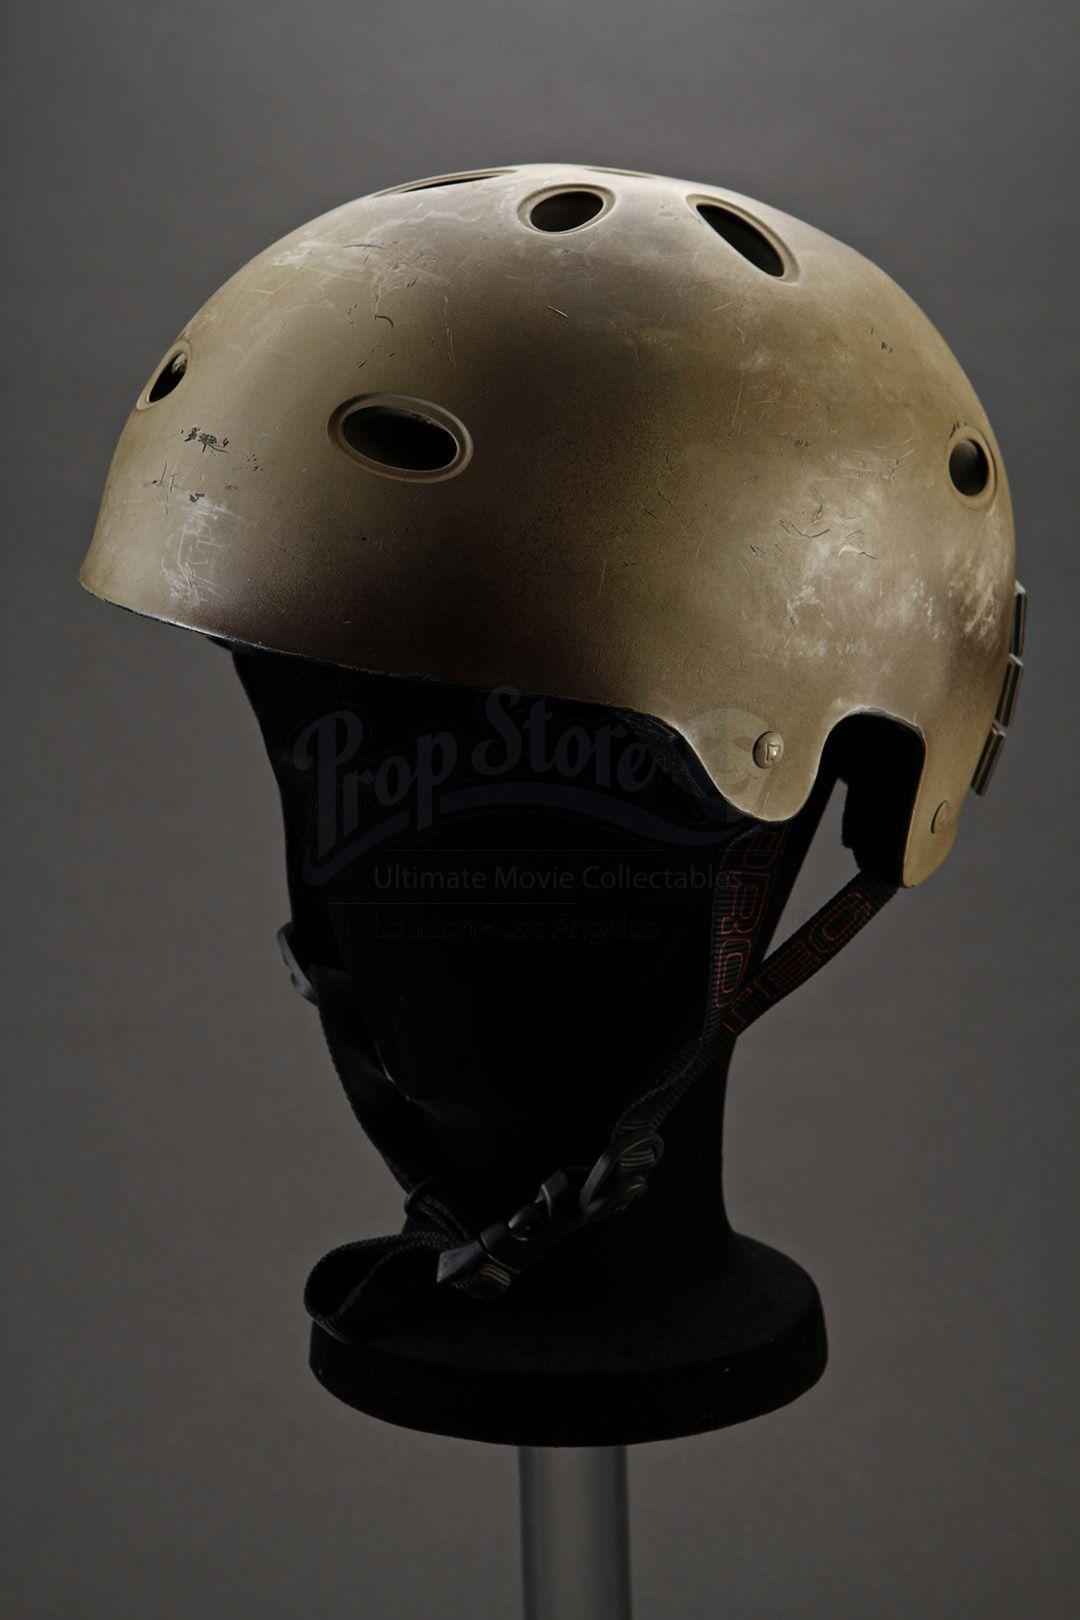 Michael murphys taylor kitsch tactical helmet prop